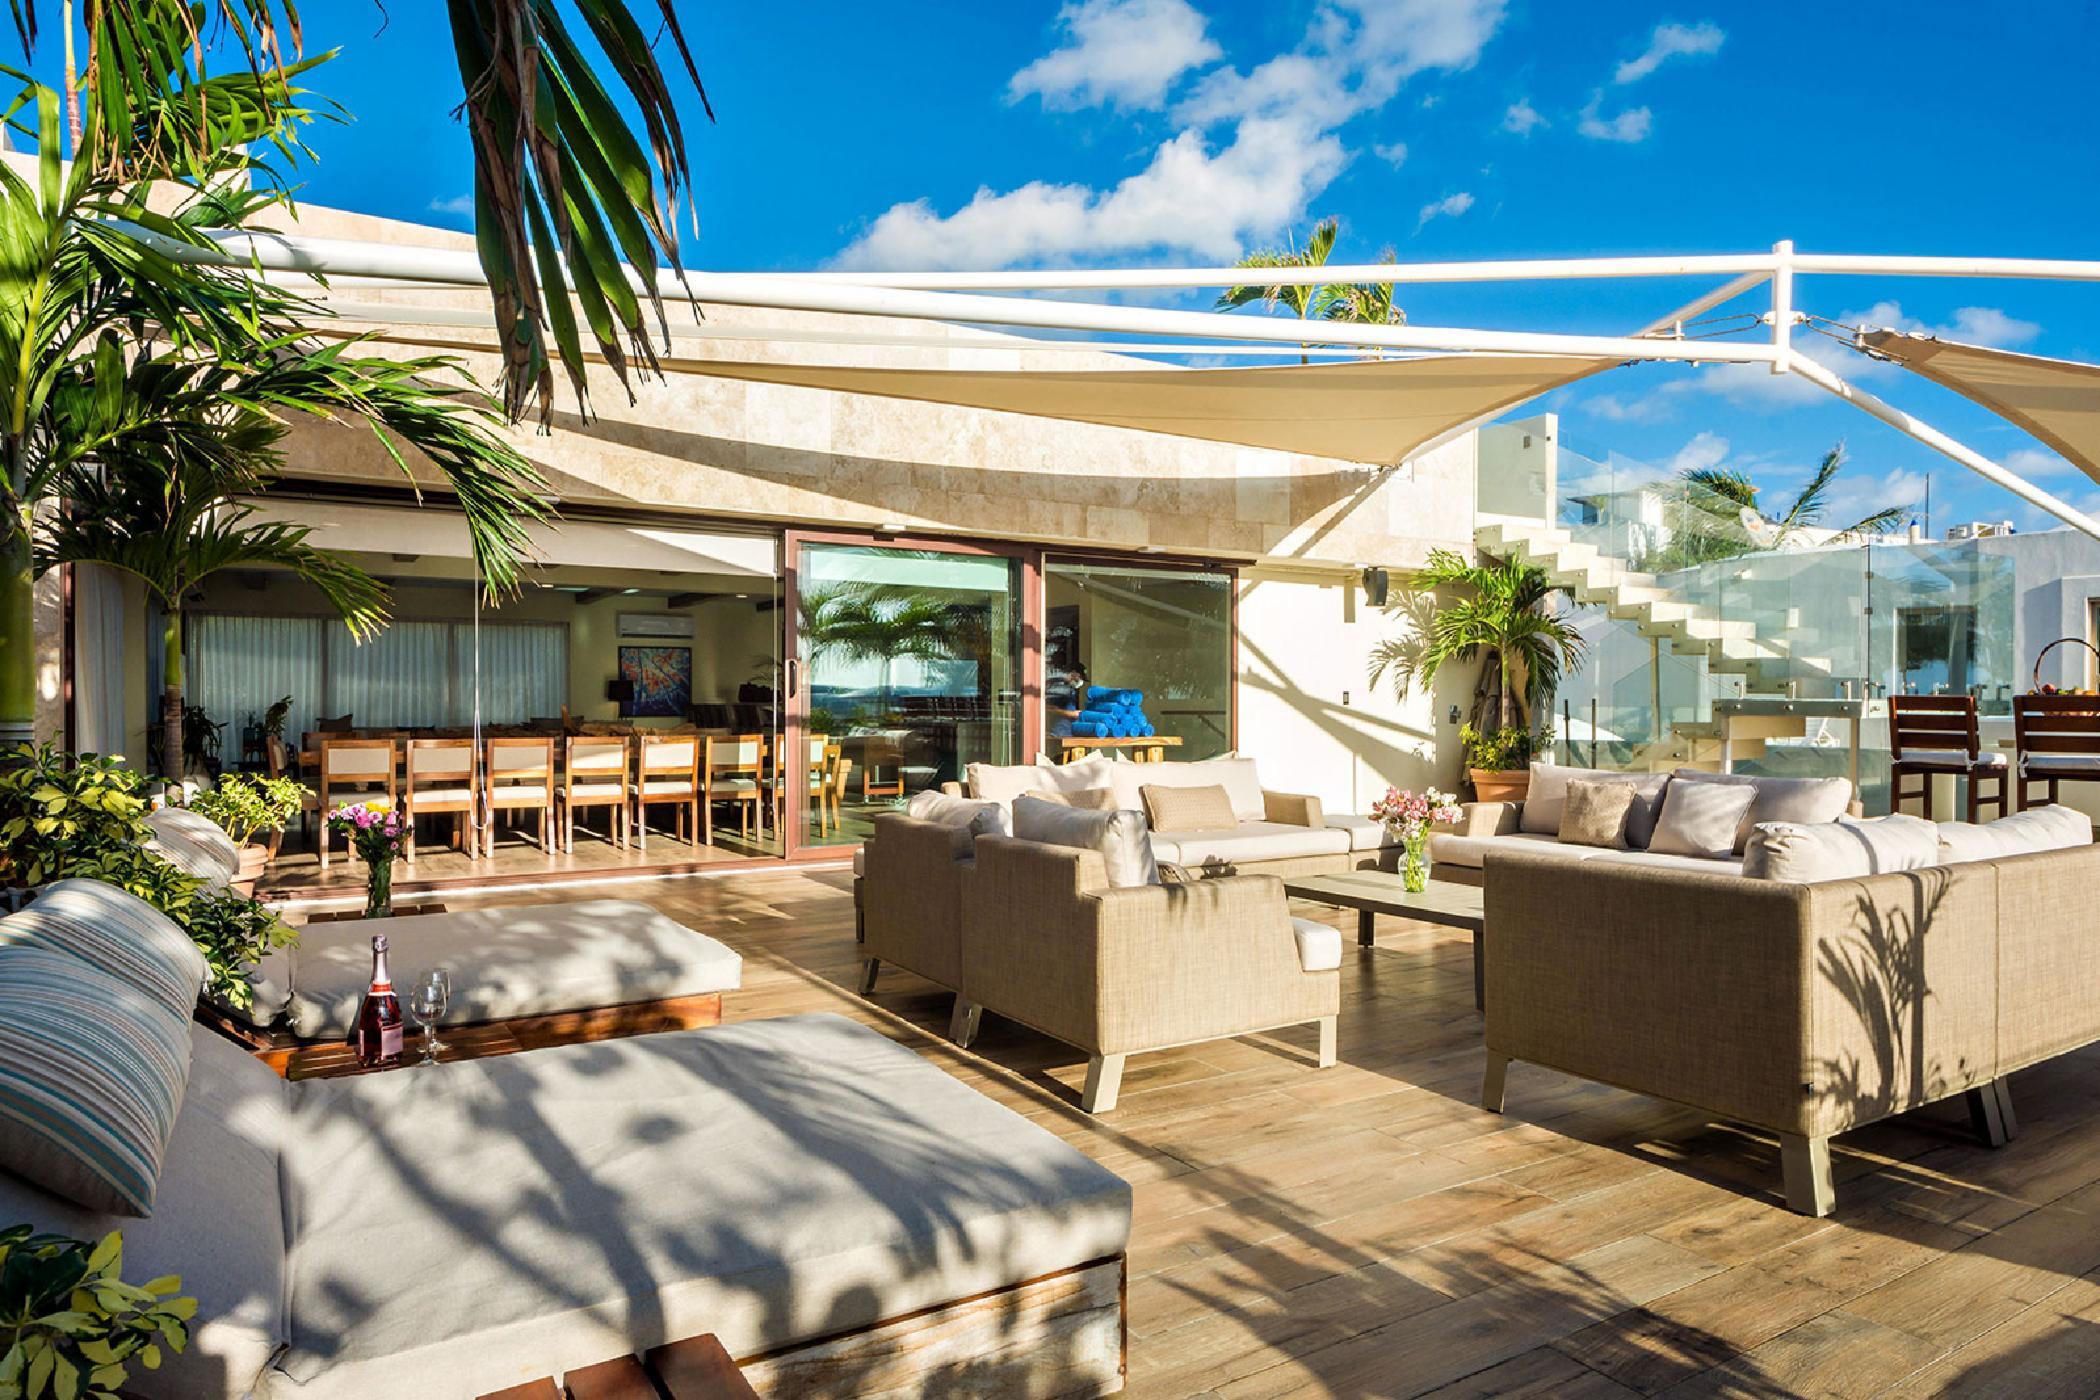 Maya_Luxe_Riviera_Maya_Luxury_Villas_Experiences_Vista_Hermosa_8.jpg